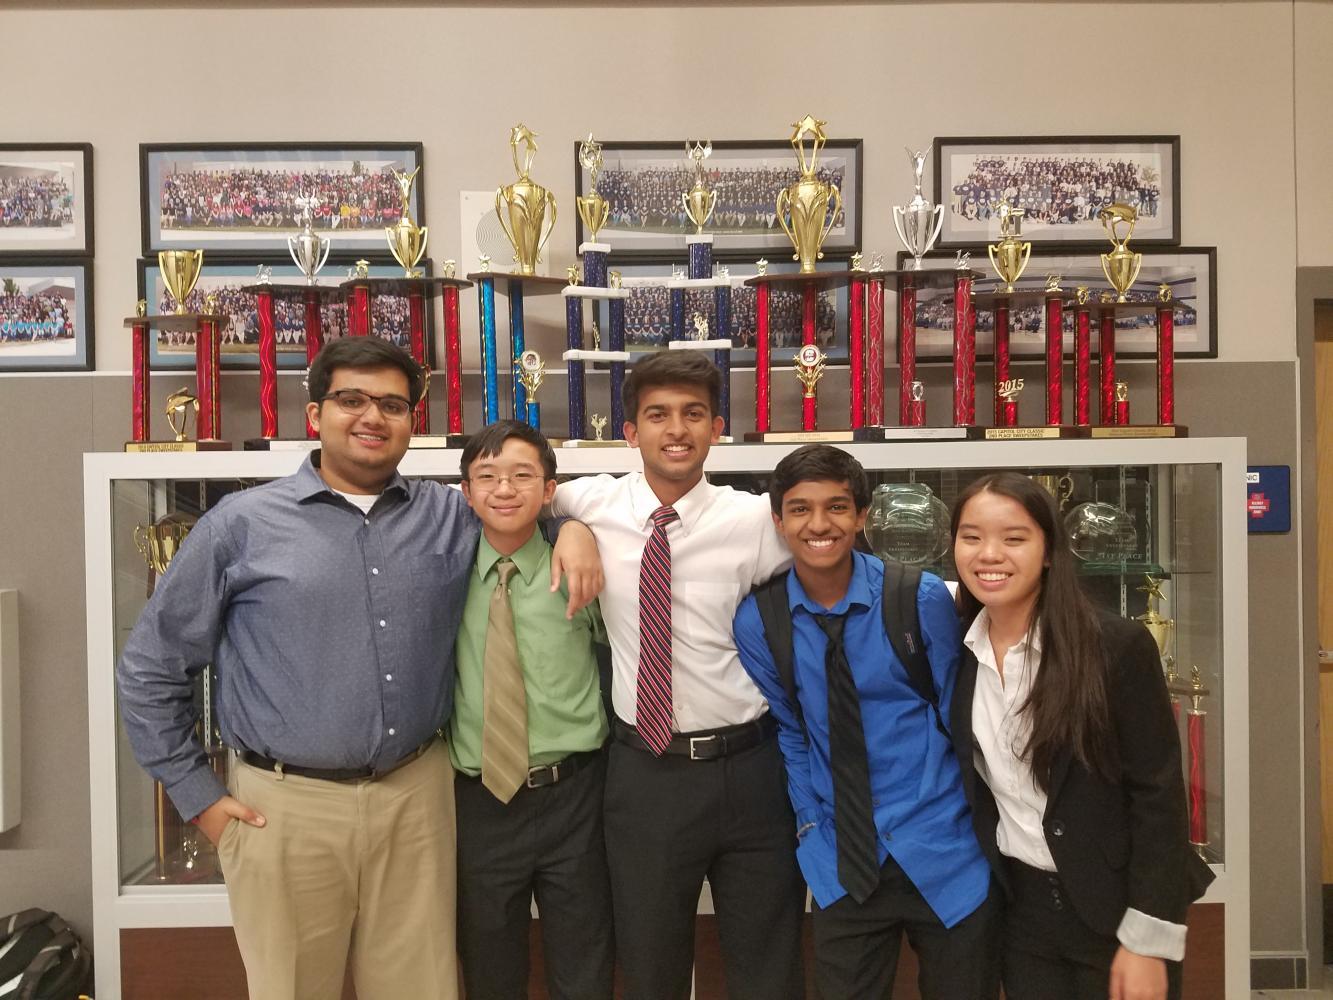 Jugal Amodwala '18, Truman Le '19, Rohith Mandavilli '19, Dhruva Mambapoor '18, and Davina Le '20 pose for a picture. Photo courtesy of WHS Debate.